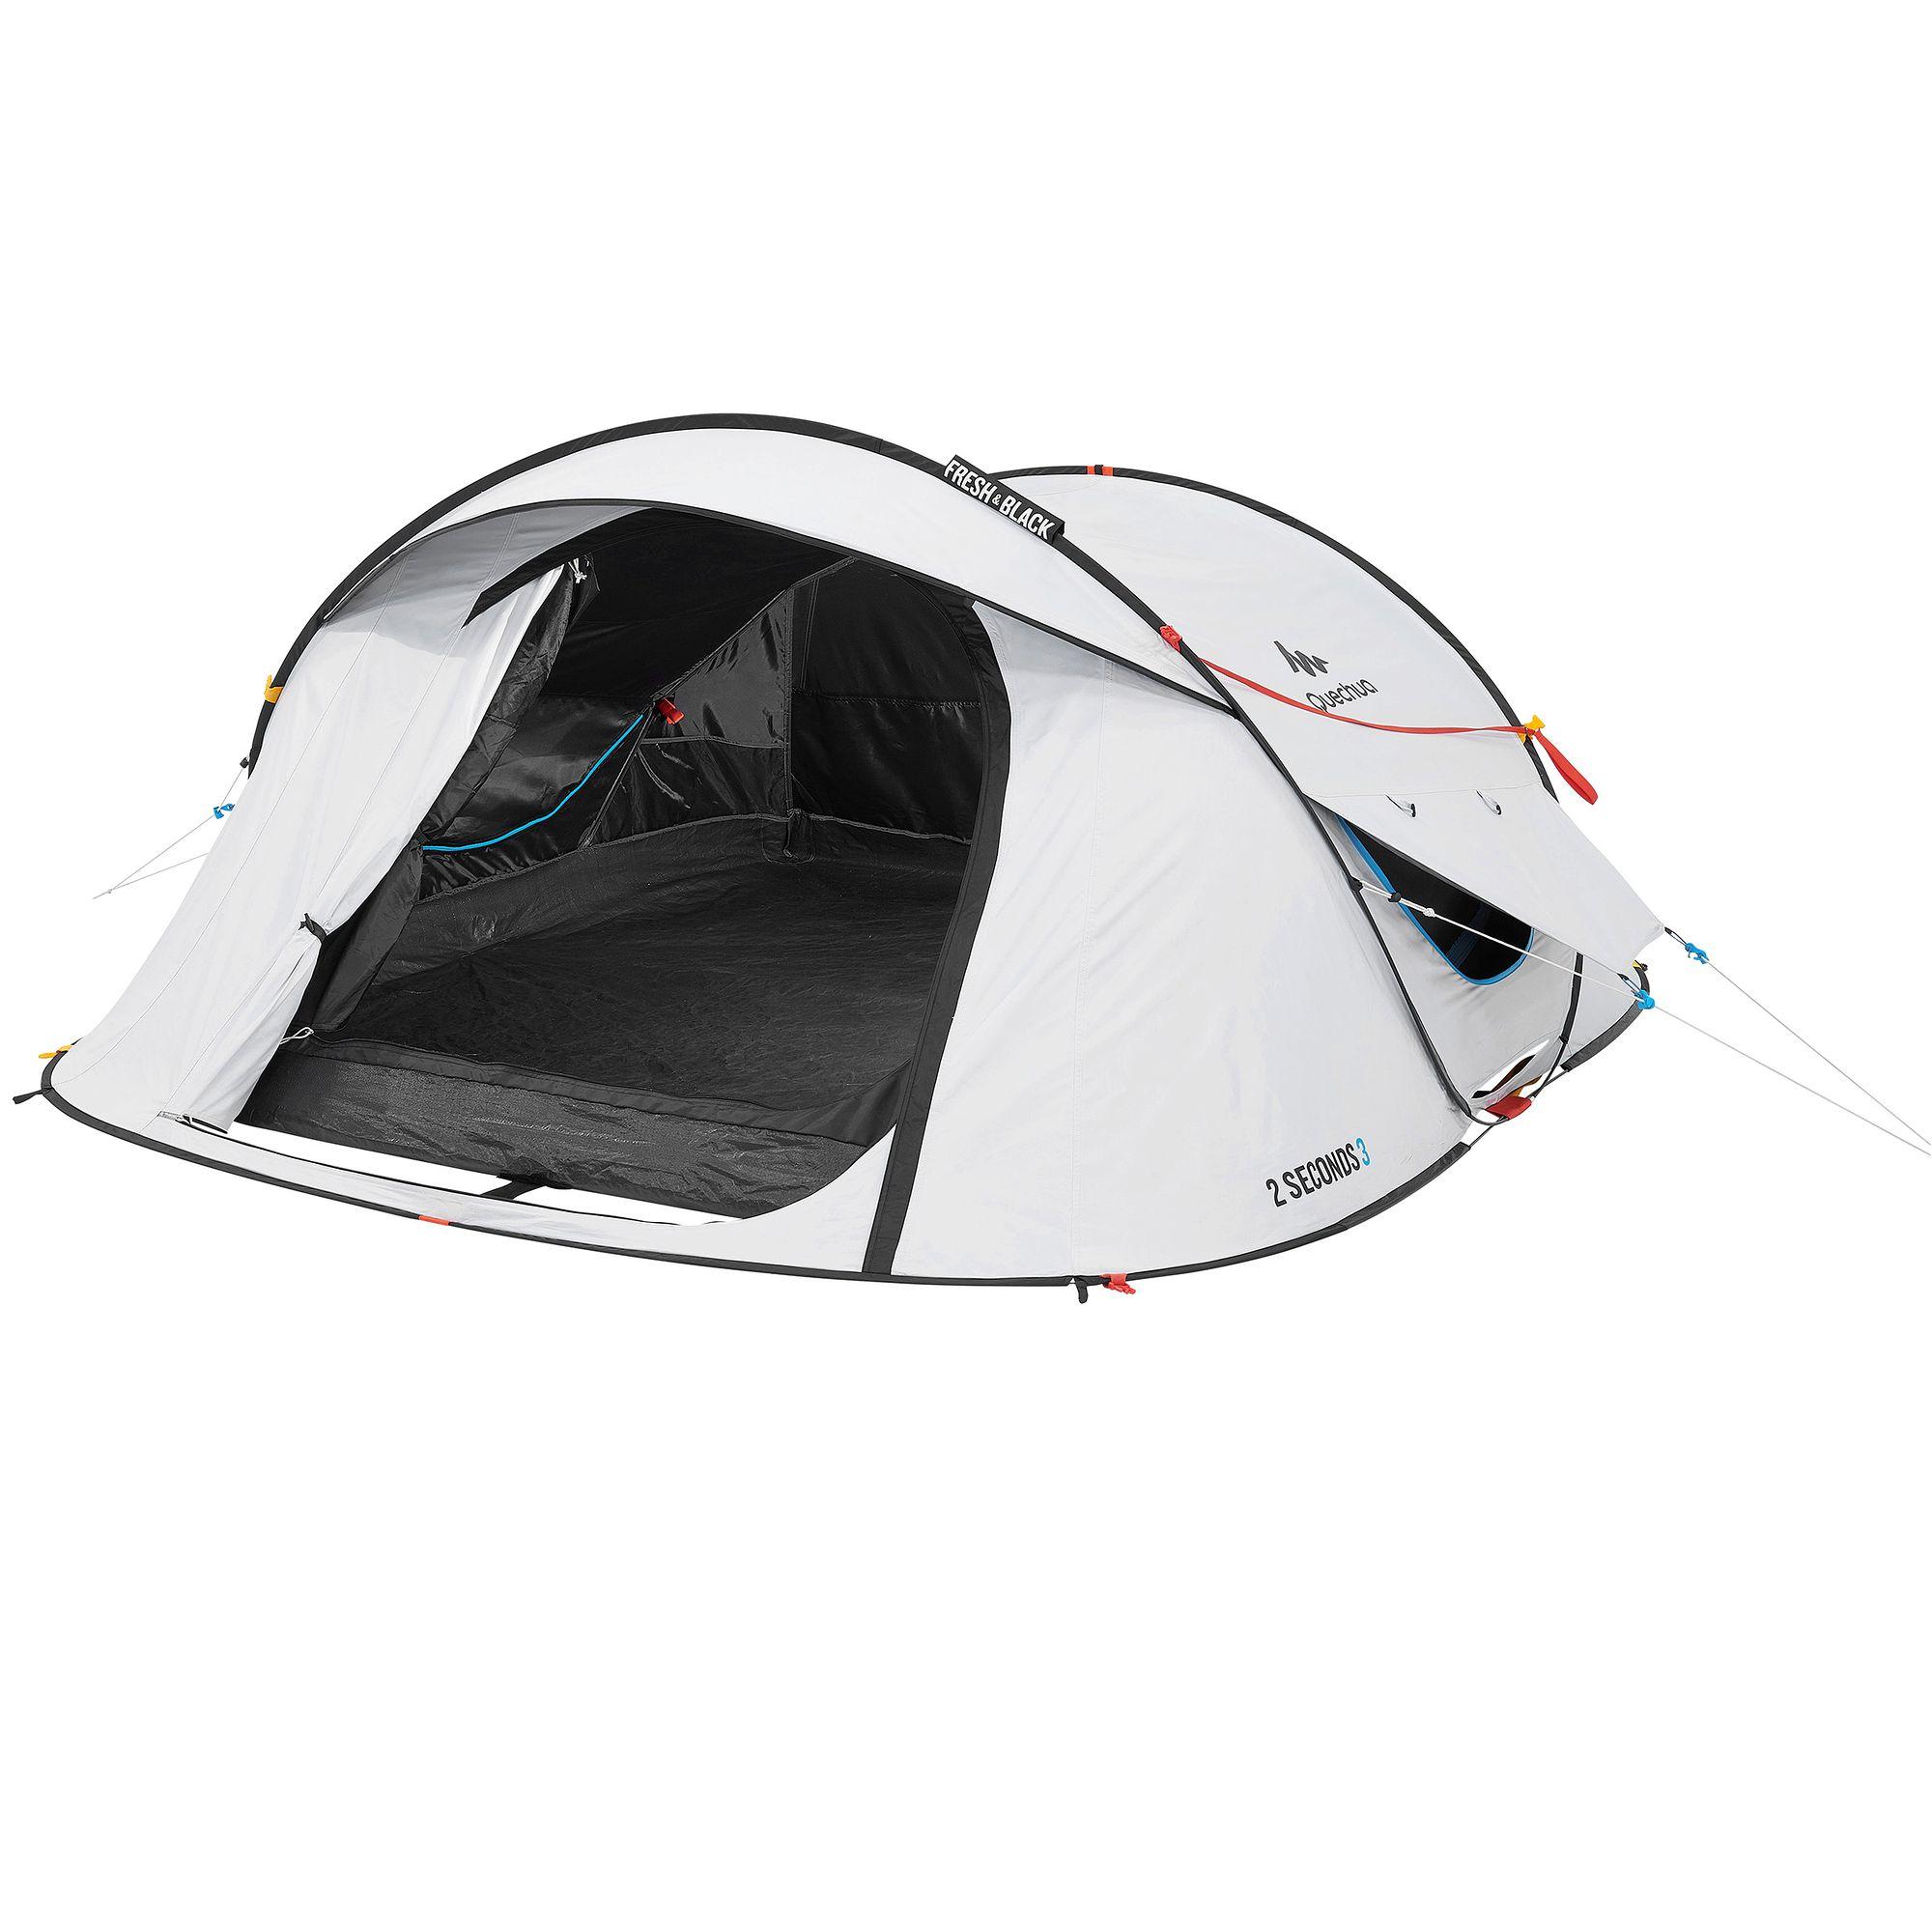 Tente de camping 2 seconds easy 3 personnes fresh&black